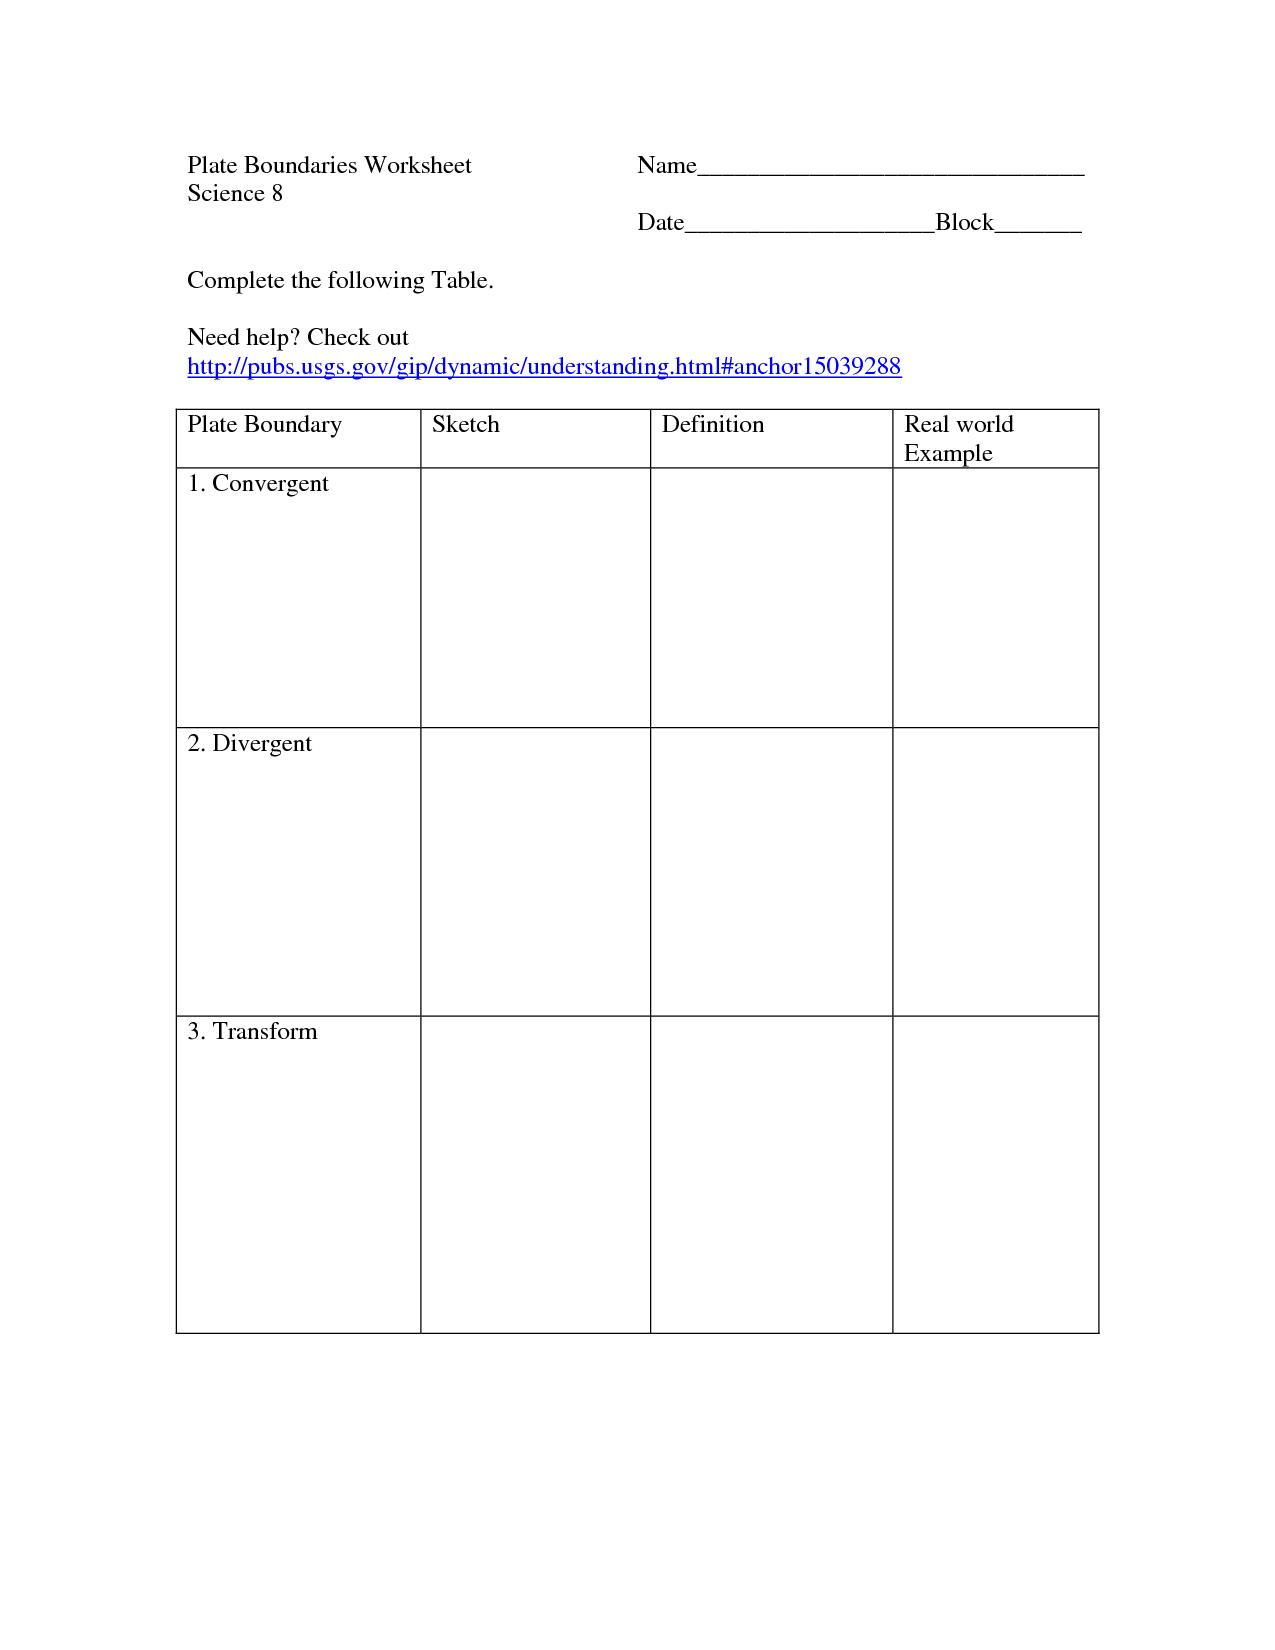 Understanding Boundaries Worksheet